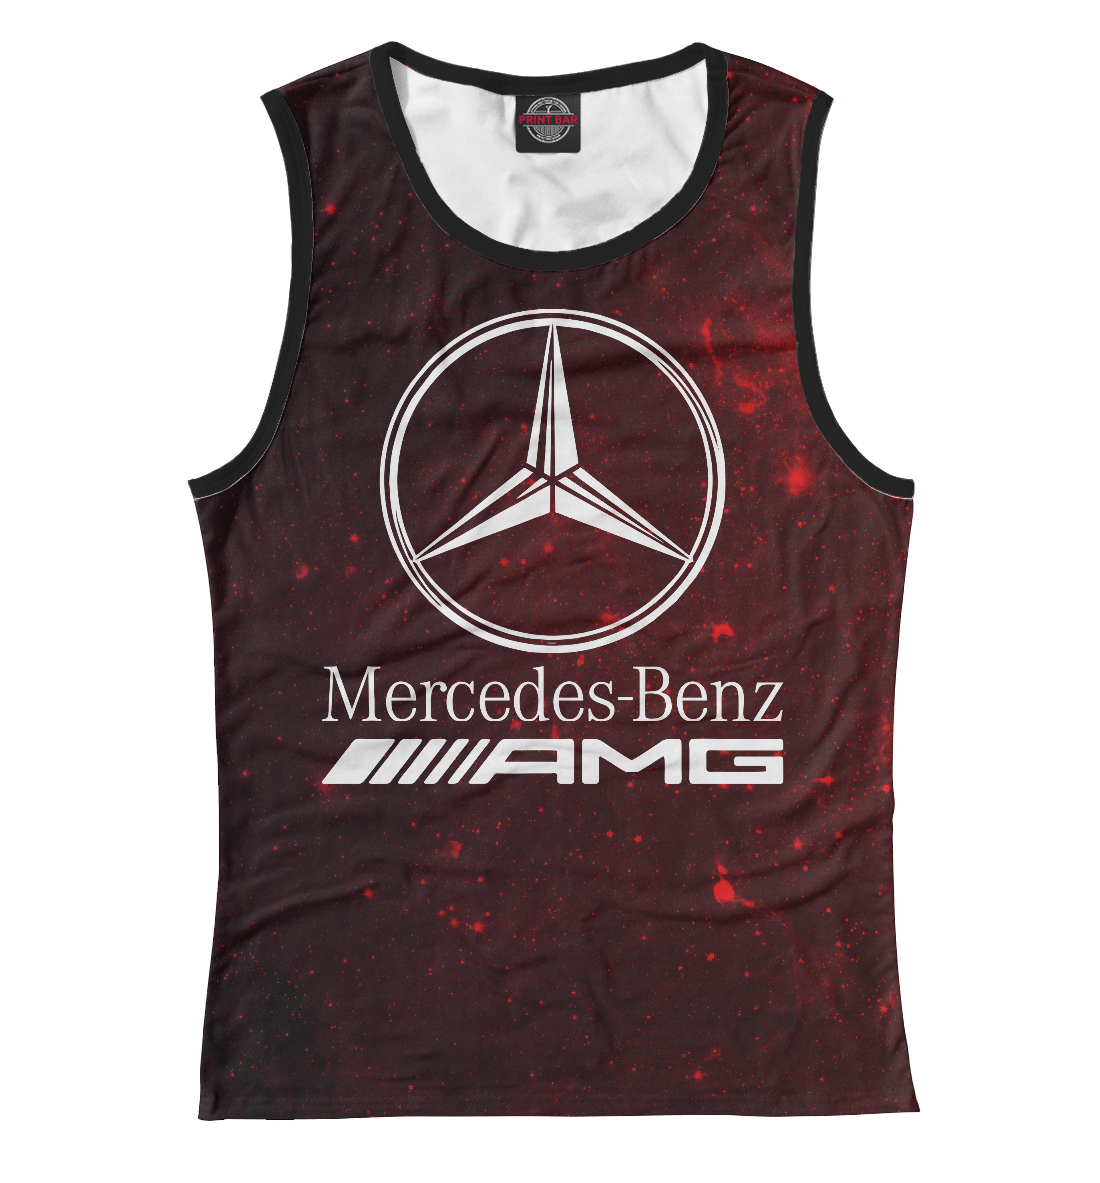 Купить Mersedes-Benz AMG, Printbar, Майки, MER-894939-may-1